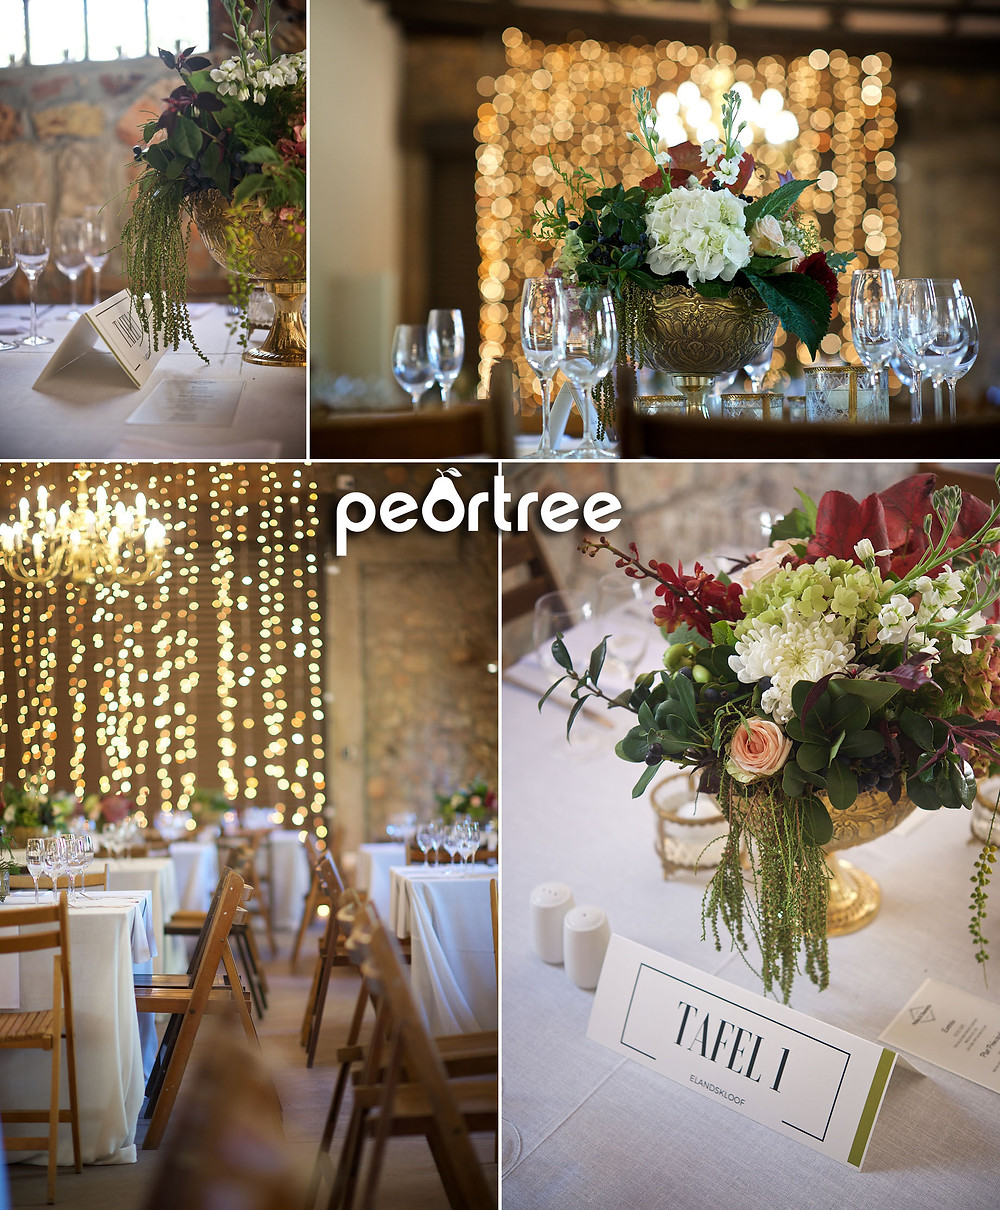 elandskloof greyton autumn wedding 4